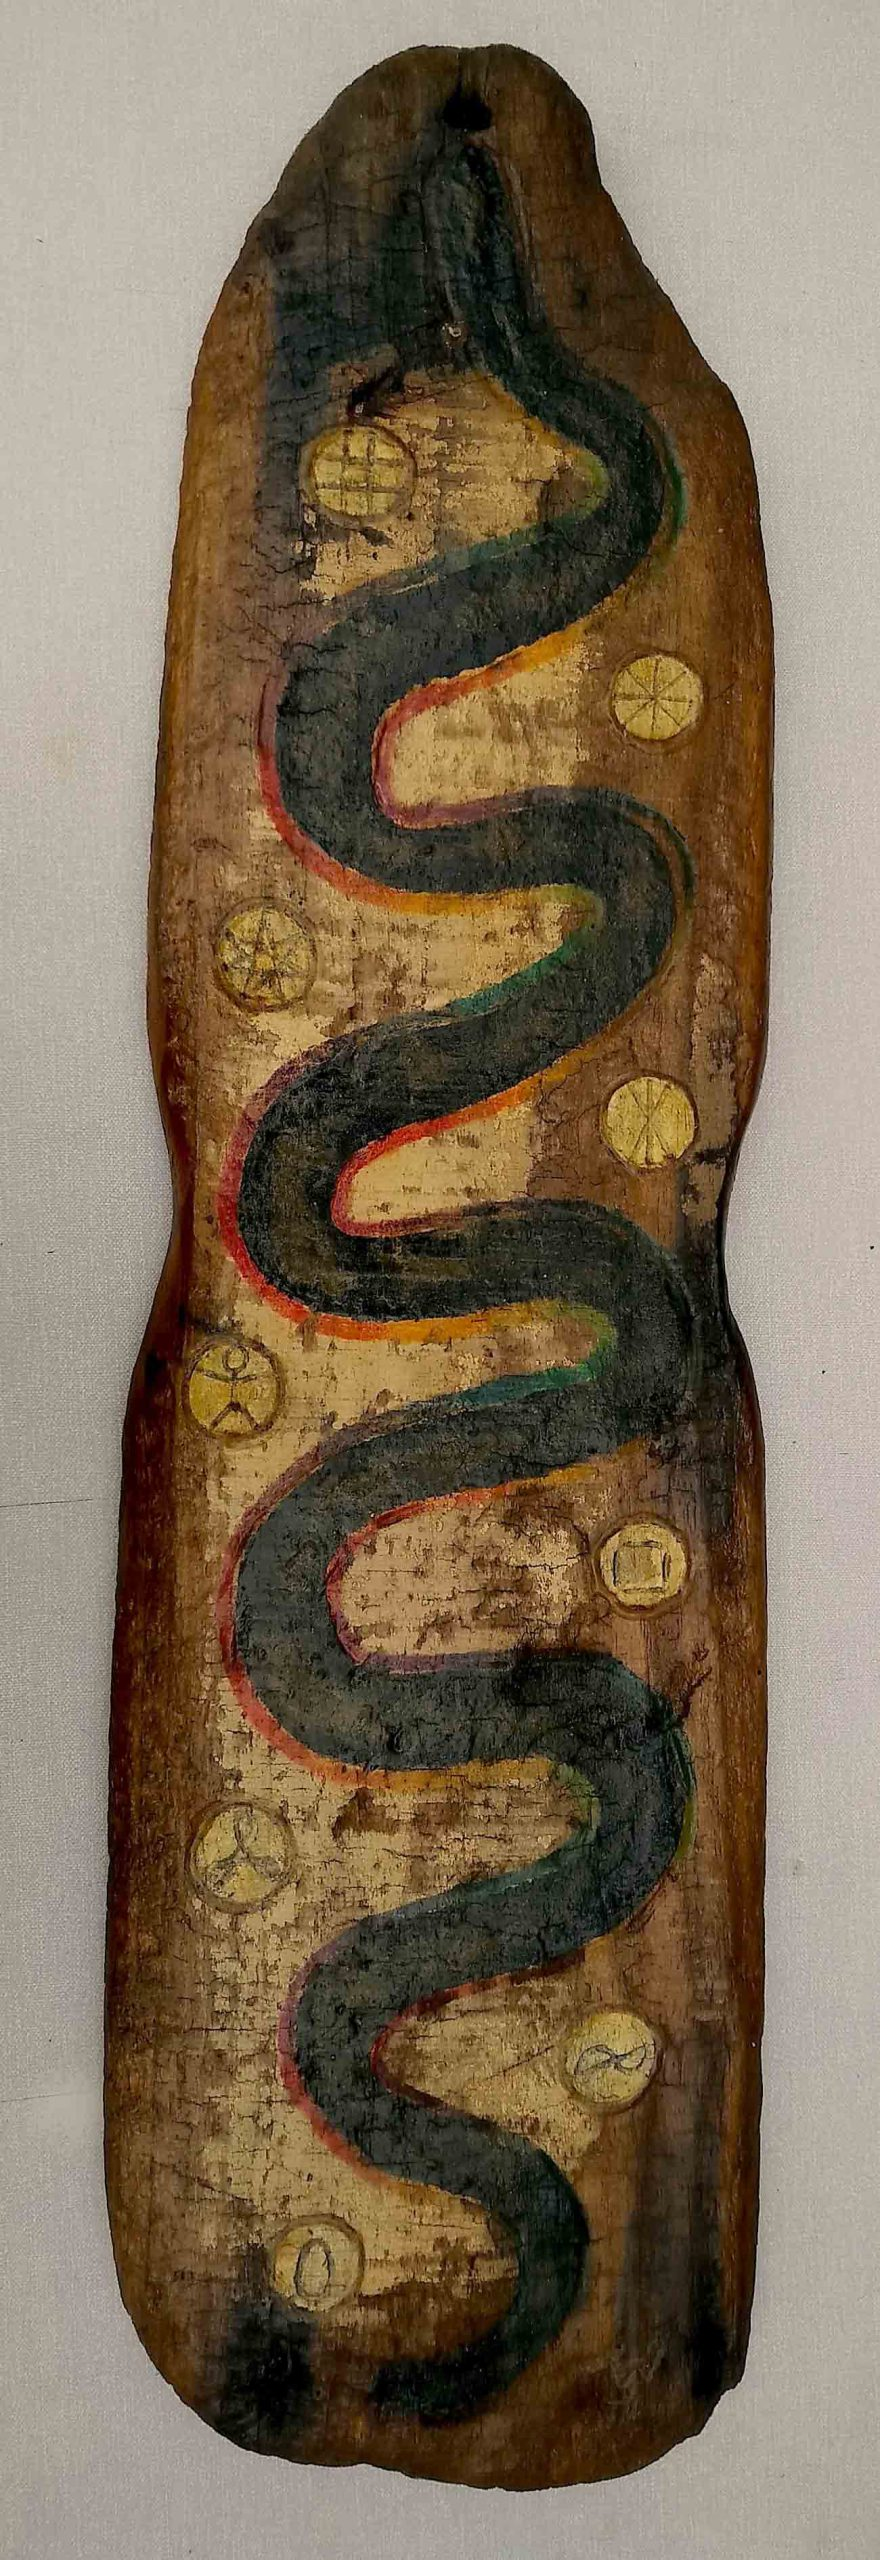 Cosmic Rainbow Snake (0 to 9)